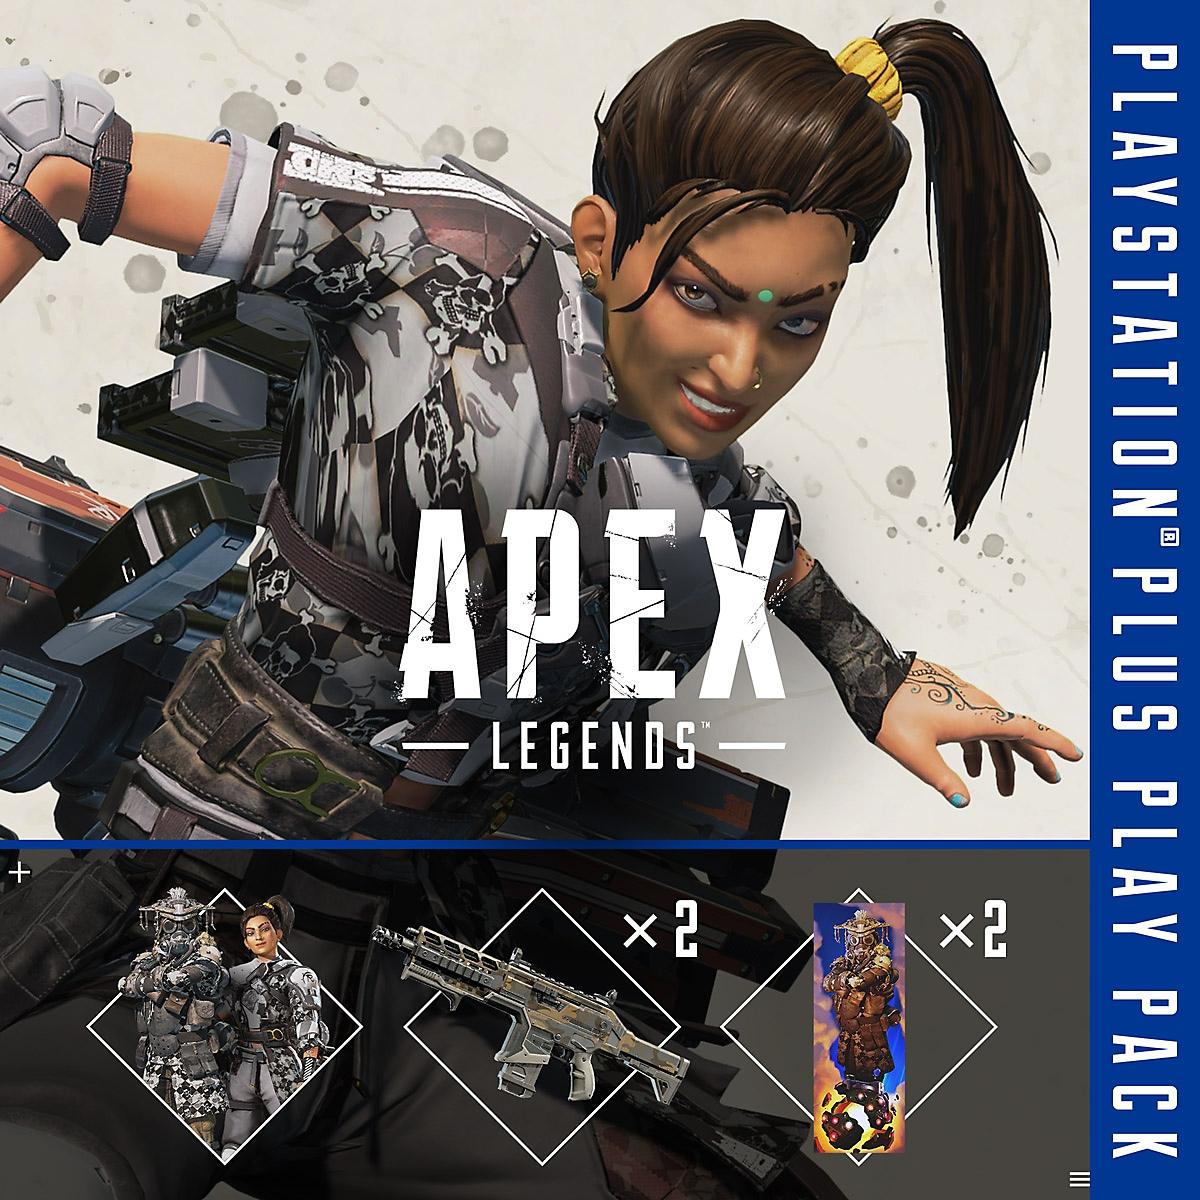 PlayStation Plus Play Pack artwork